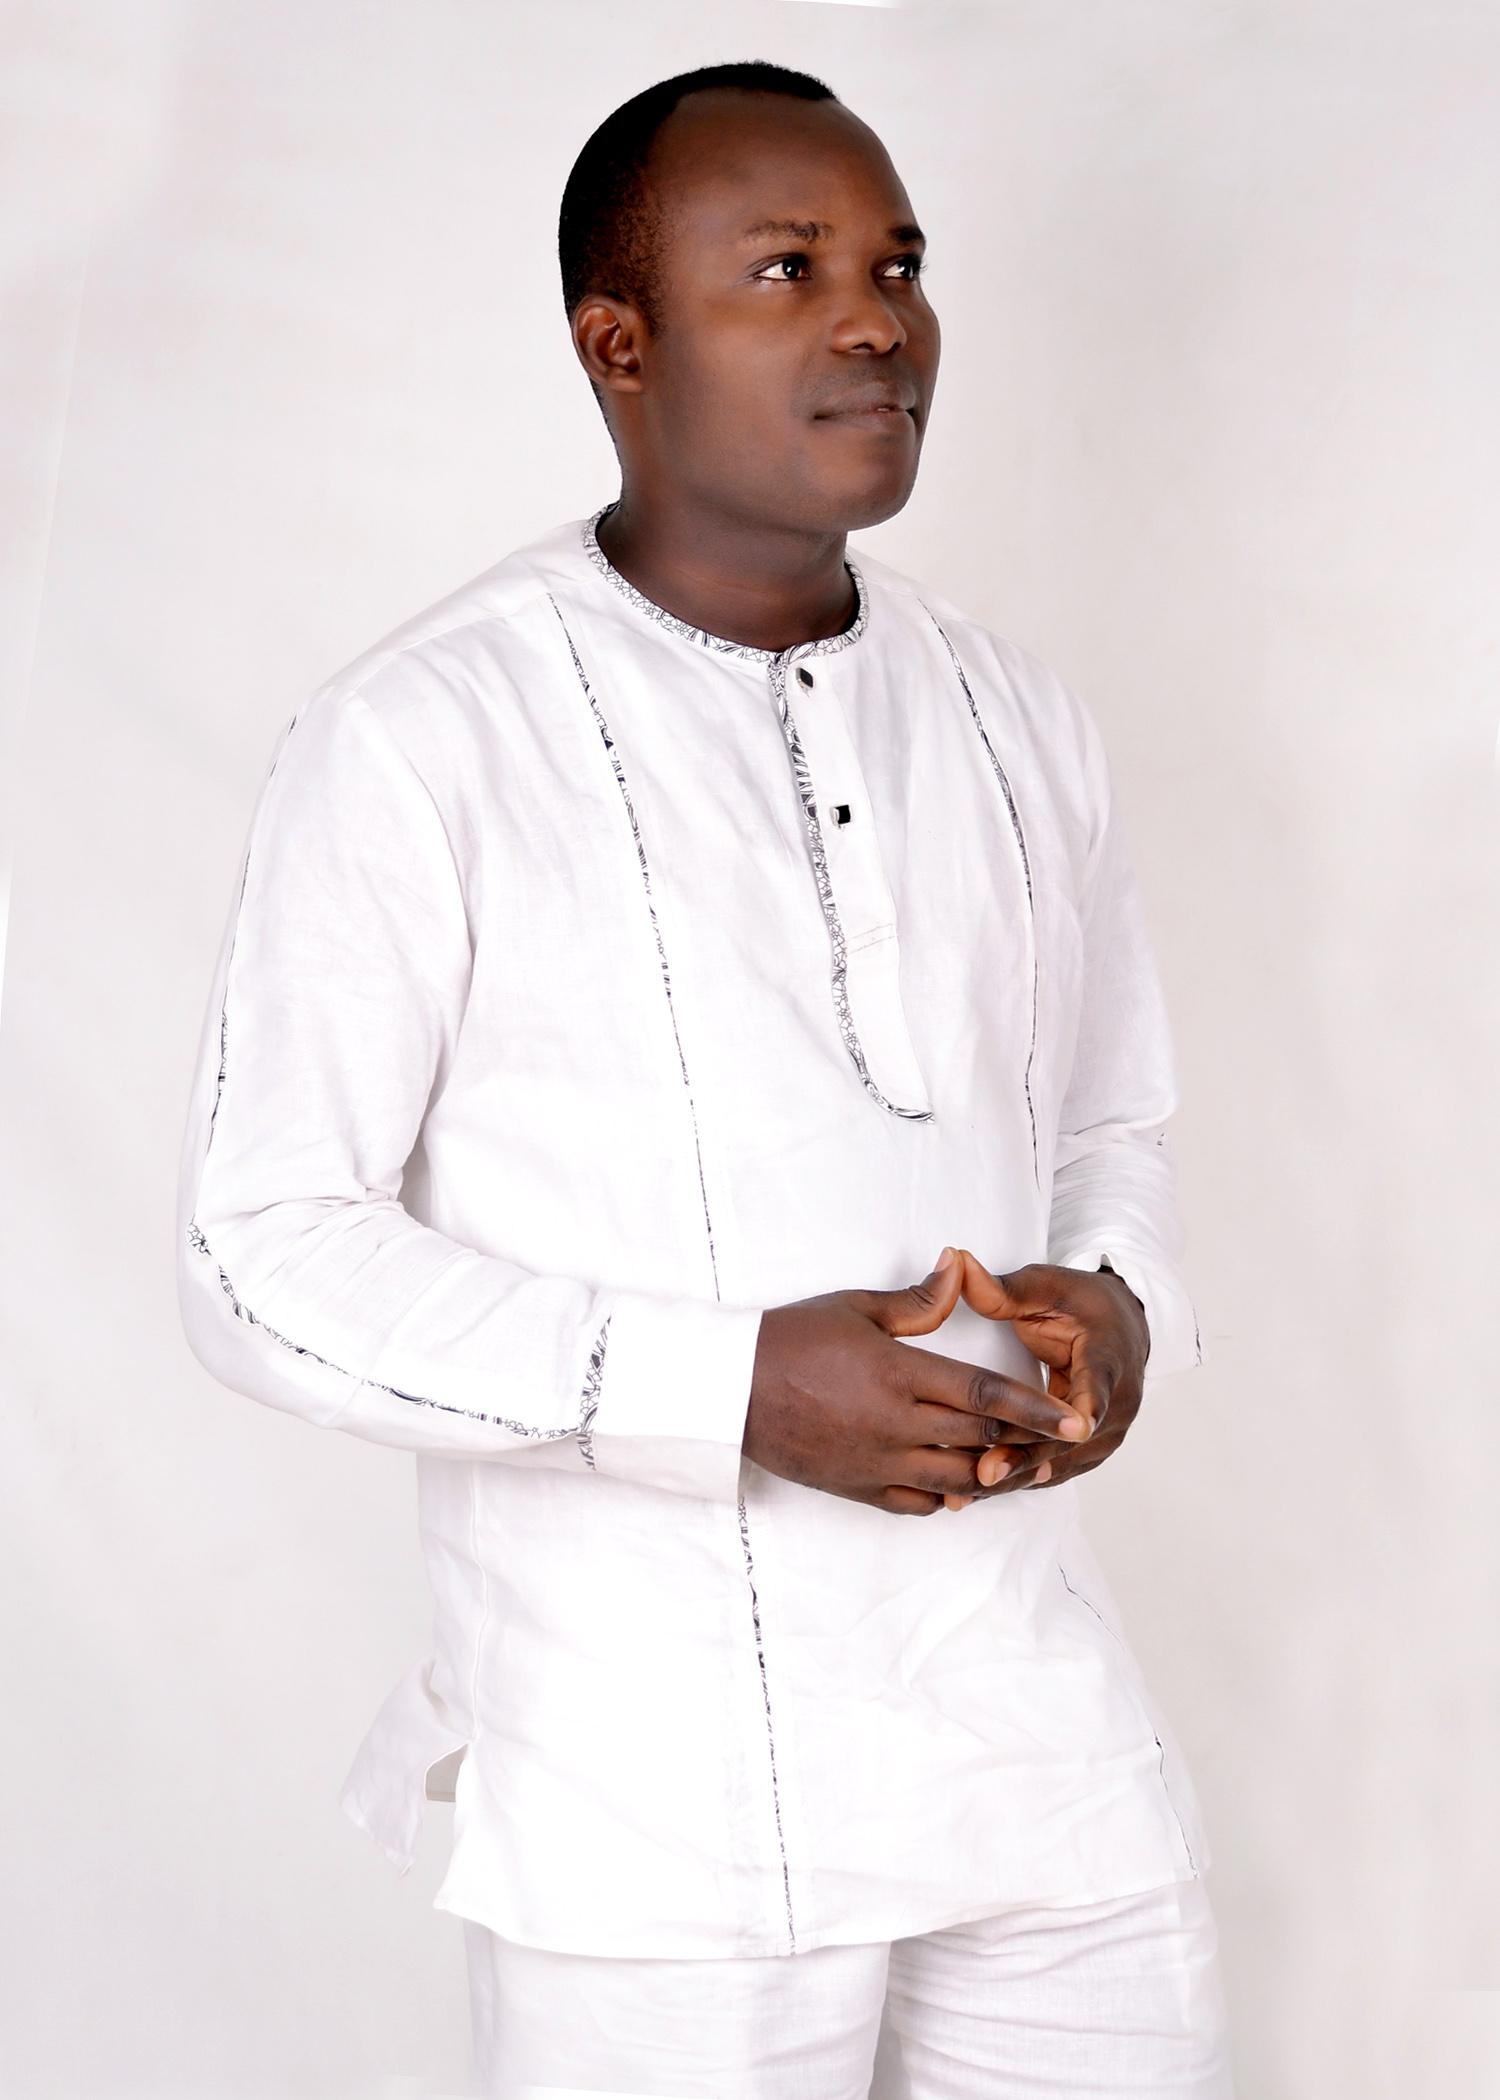 Kanmitujoye avatar picture